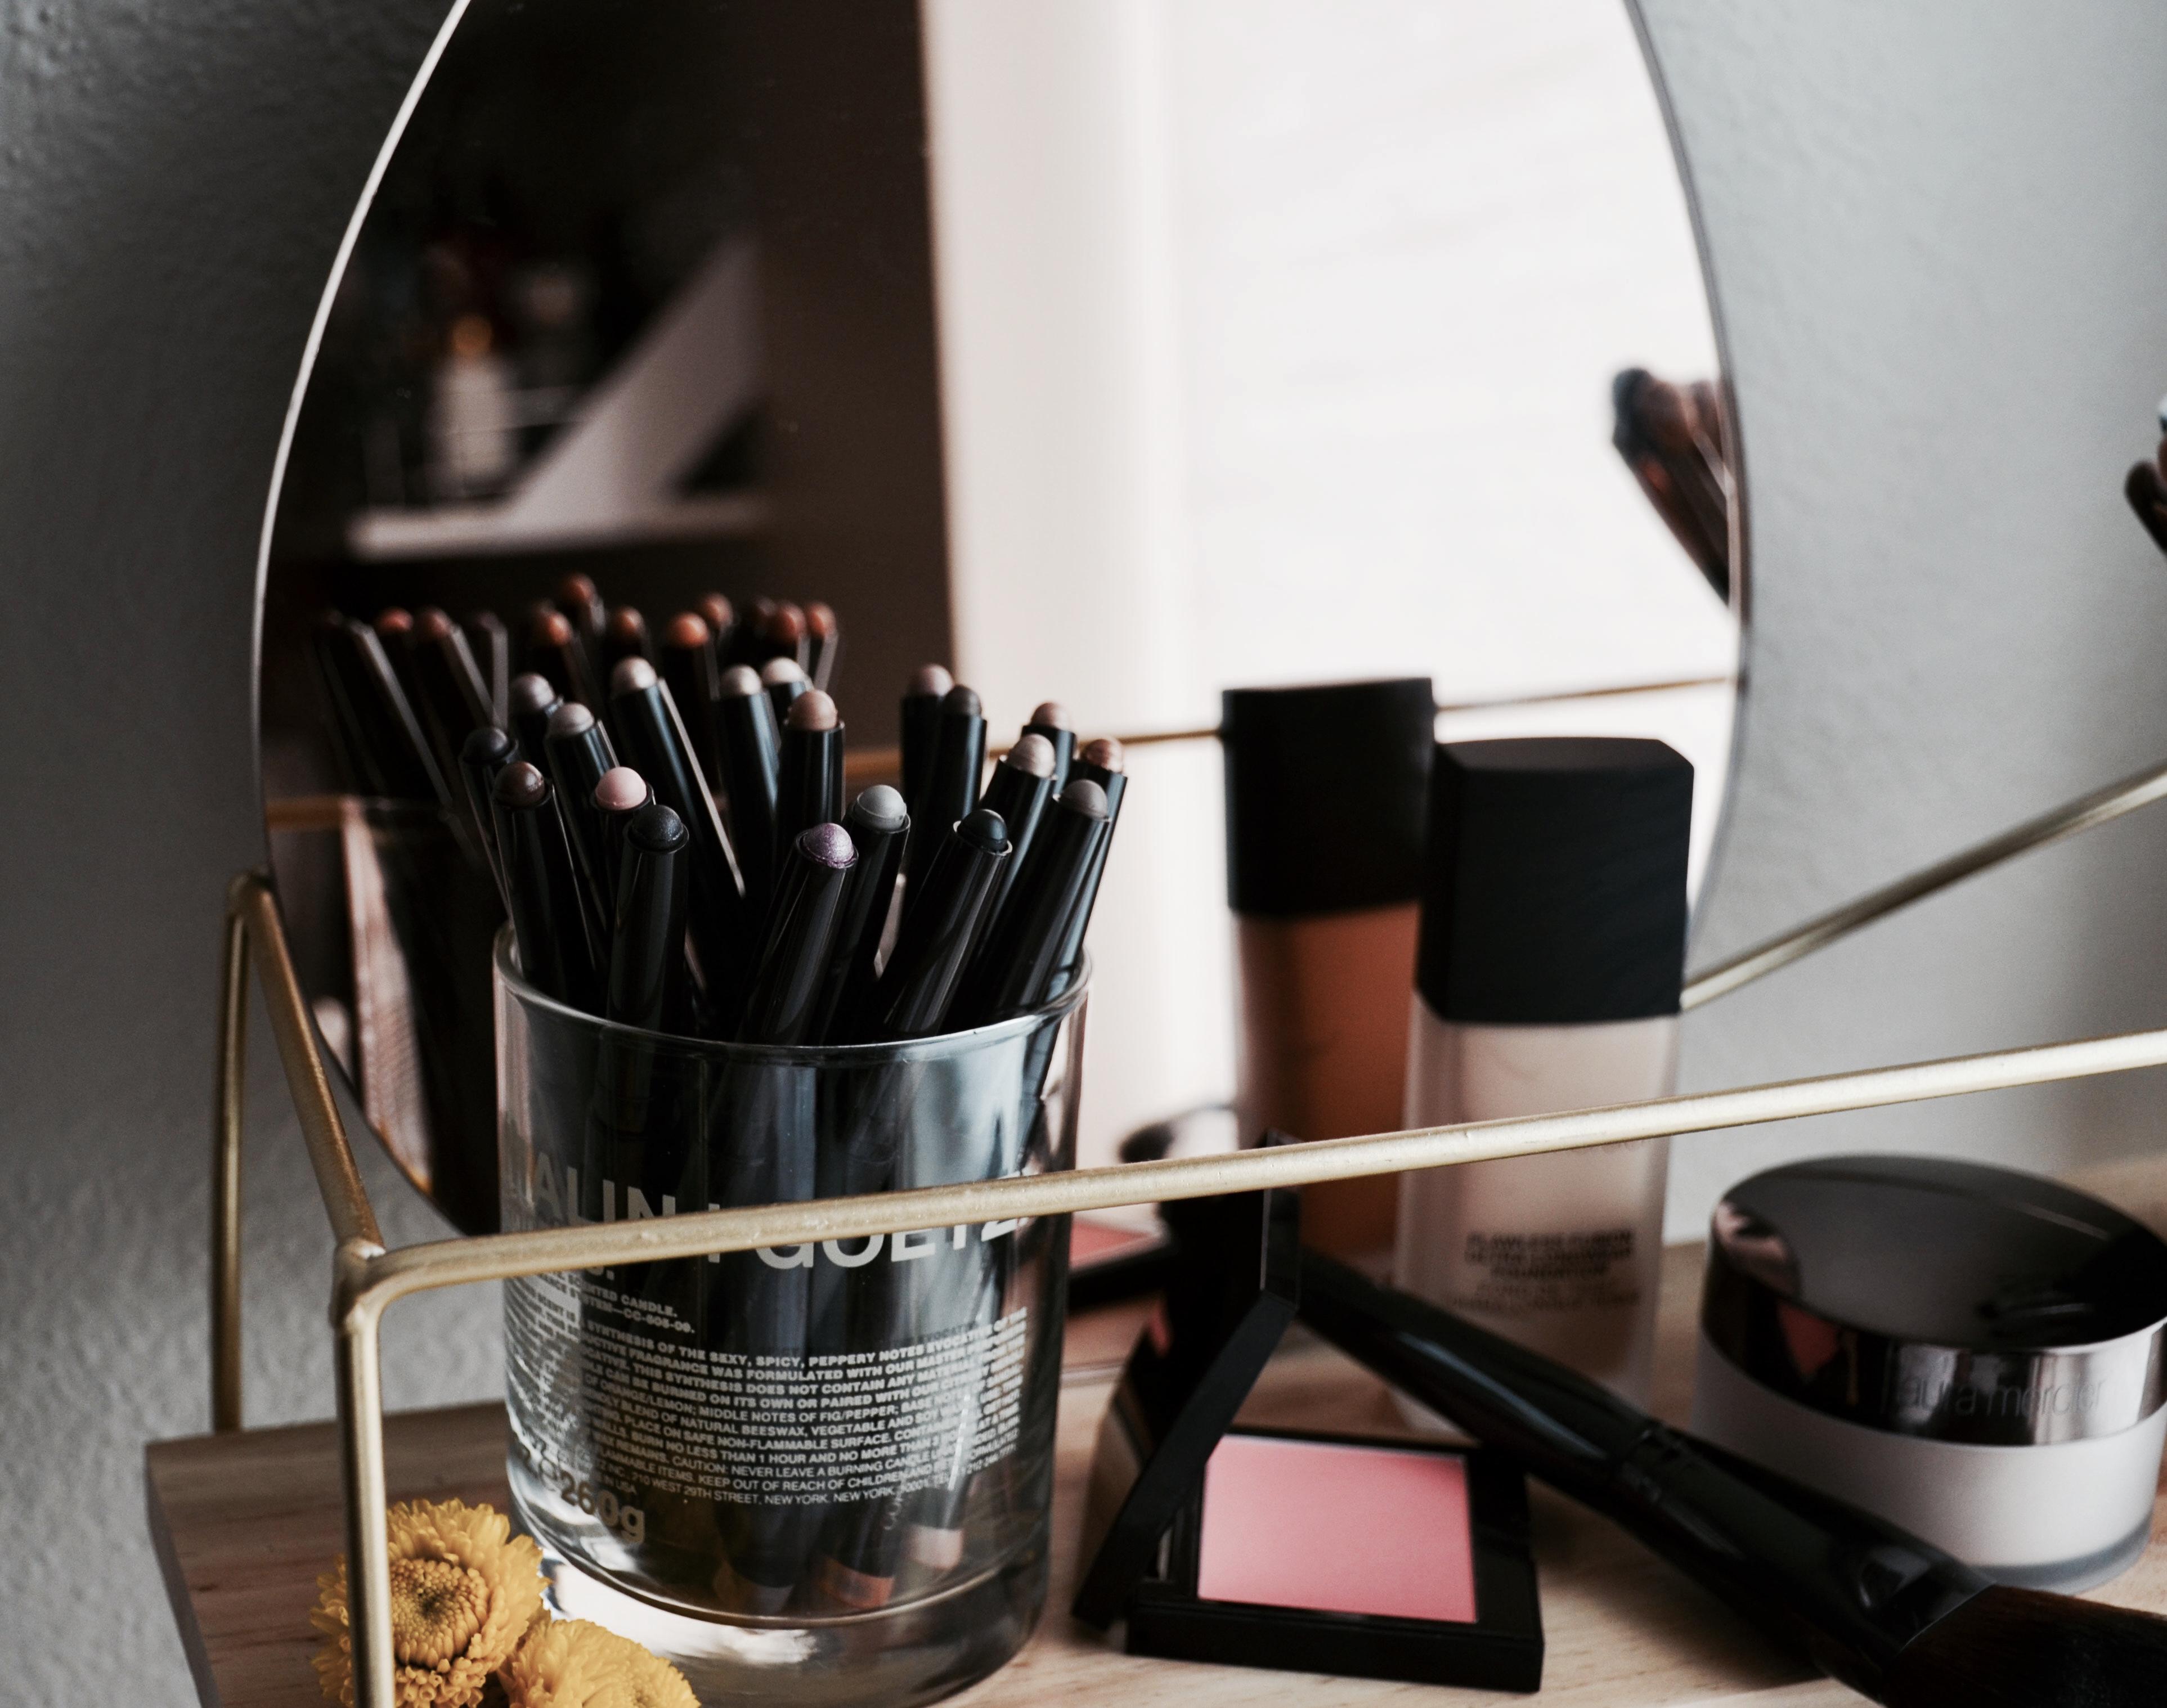 Laura Mercier Caviar Stick Eyeshadows